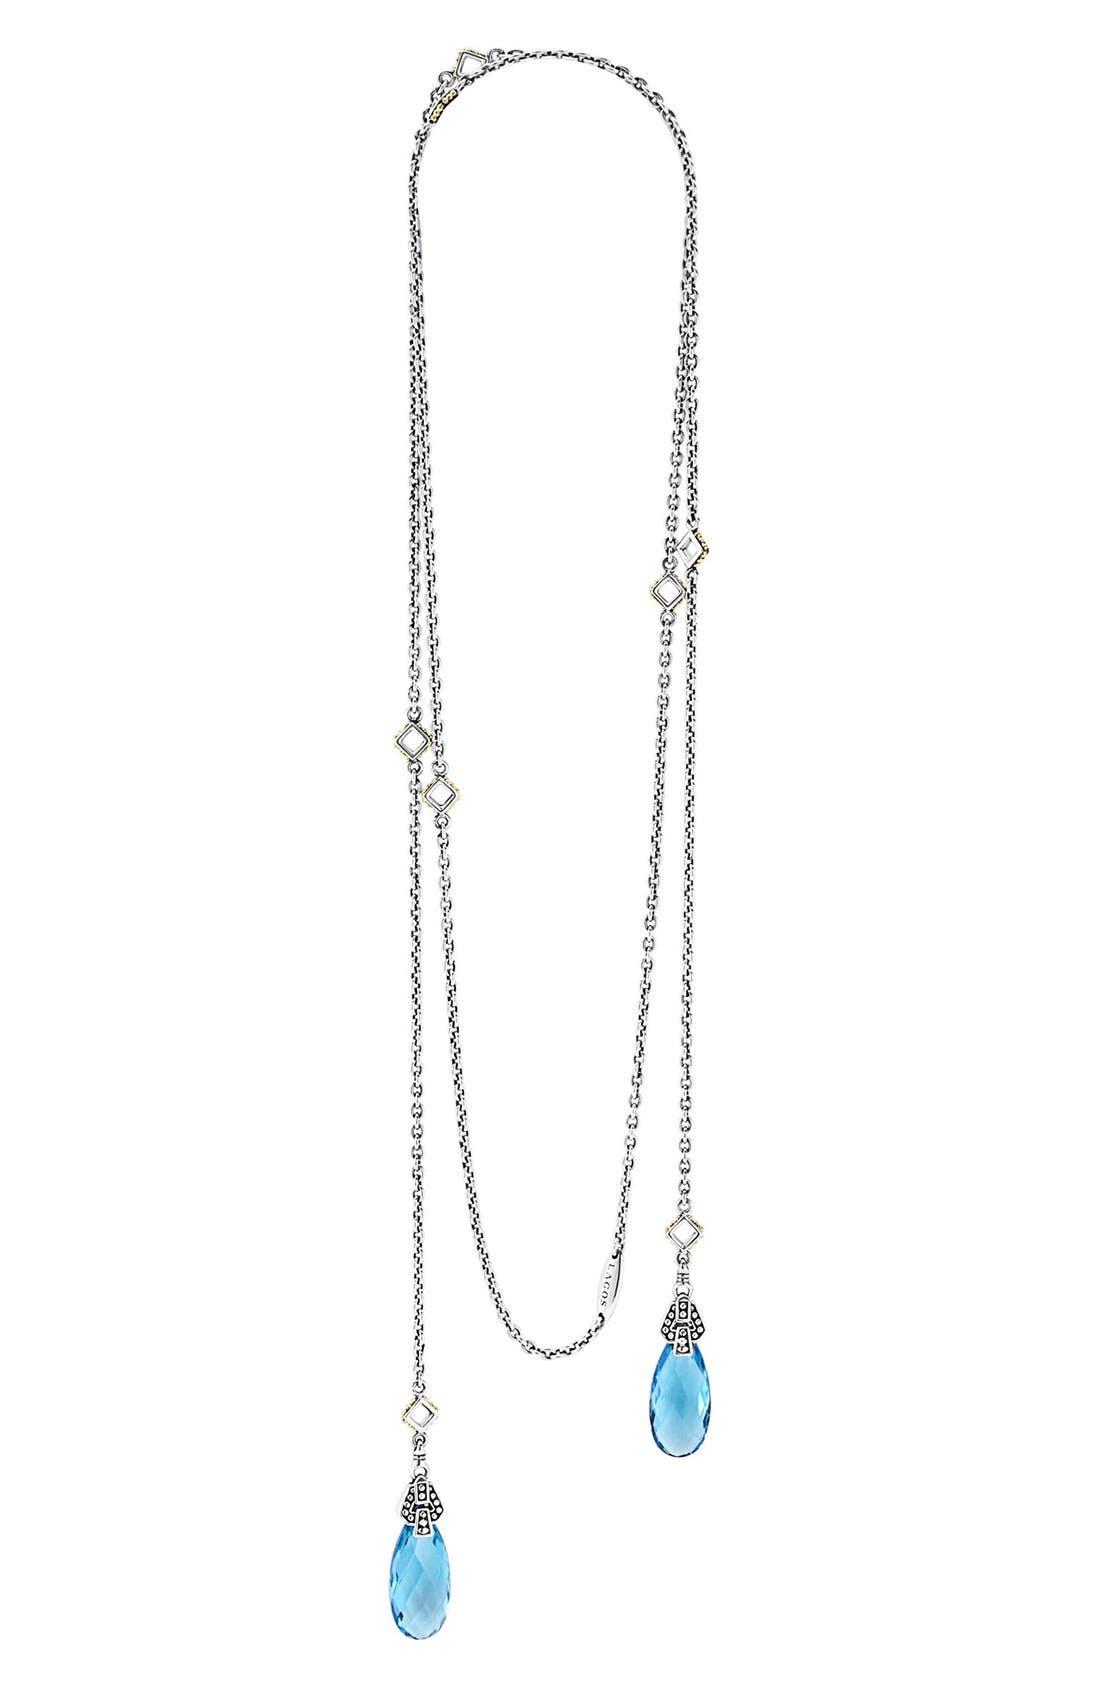 LAGOS 'Caviar Color' Semiprecious Stone Lariat Necklace